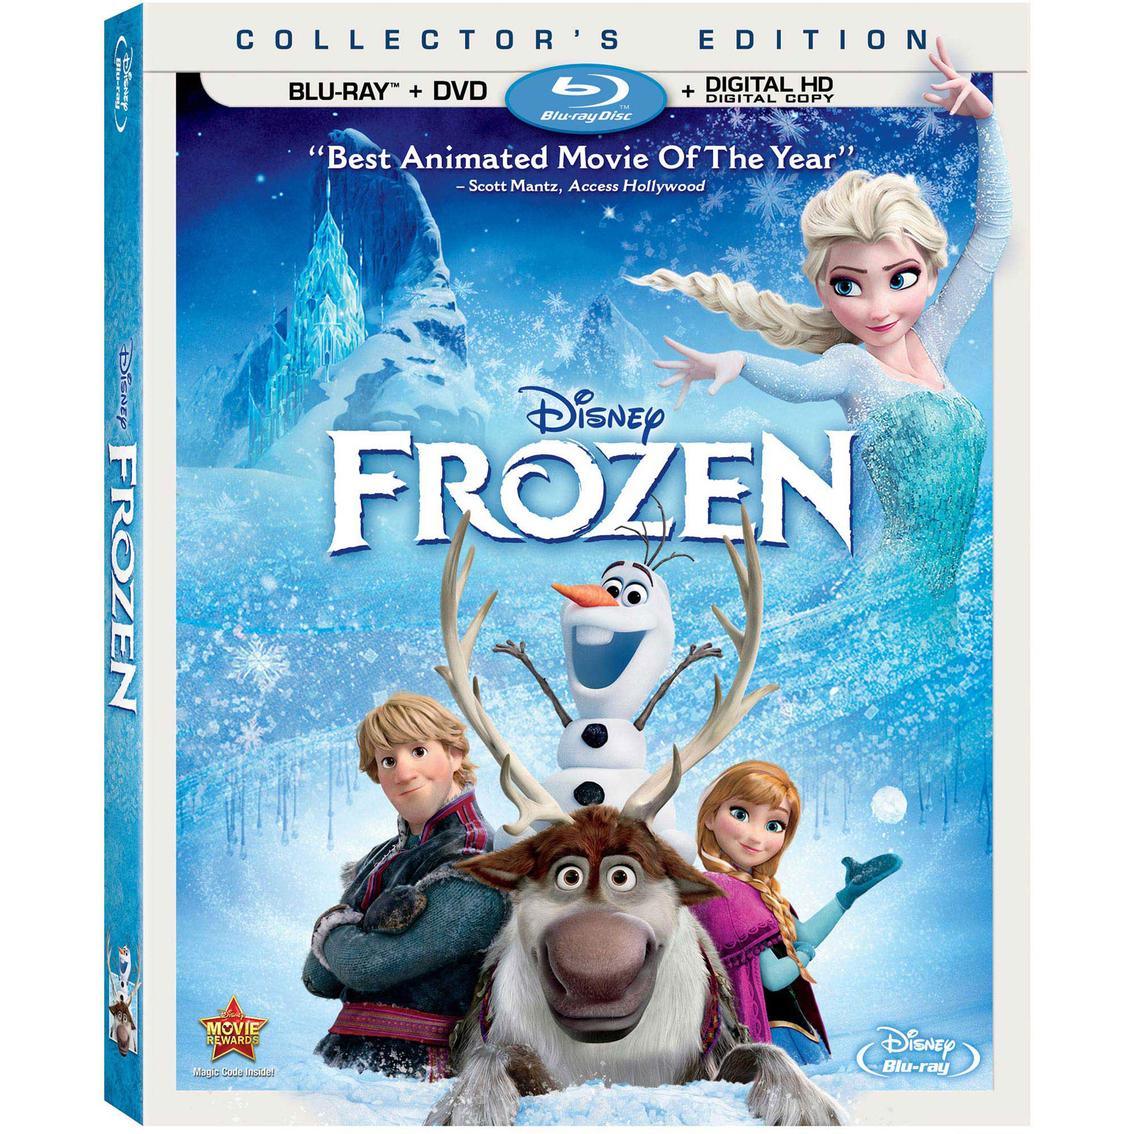 disney frozen collector's edition (blu-ray + dvd + digital hd